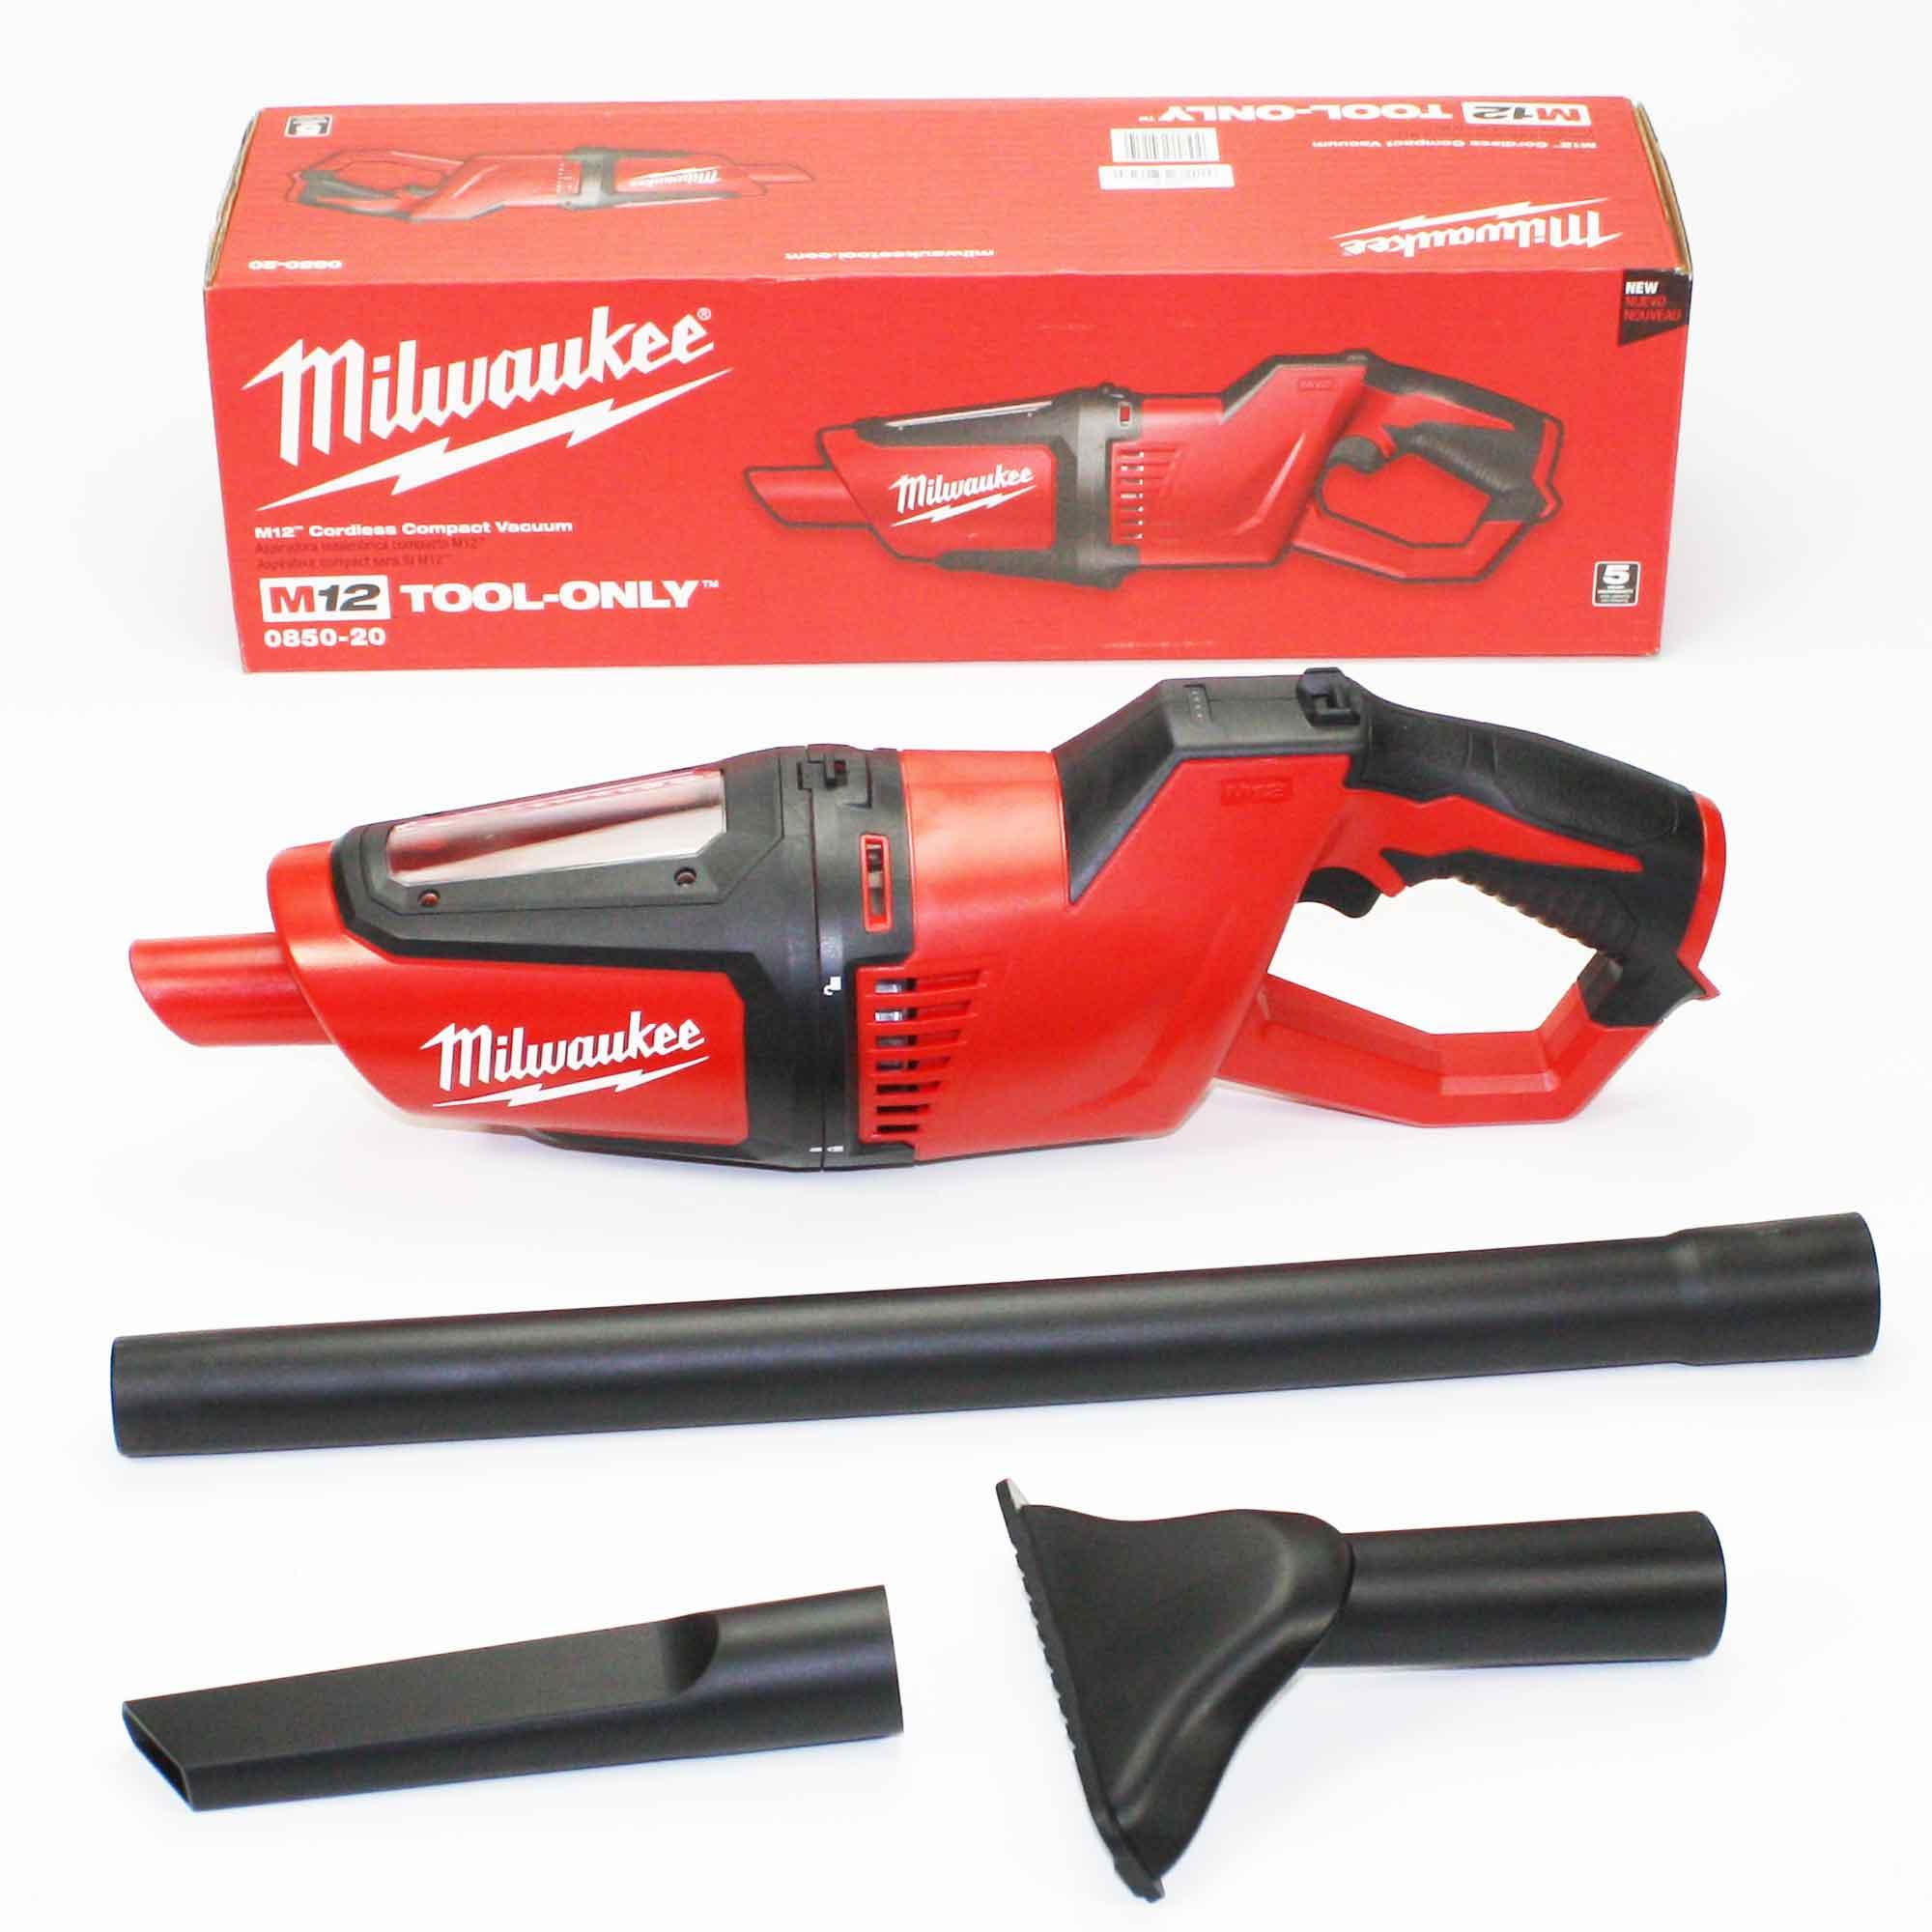 The Best Lightweight Handheld Cordless Vacuum for...